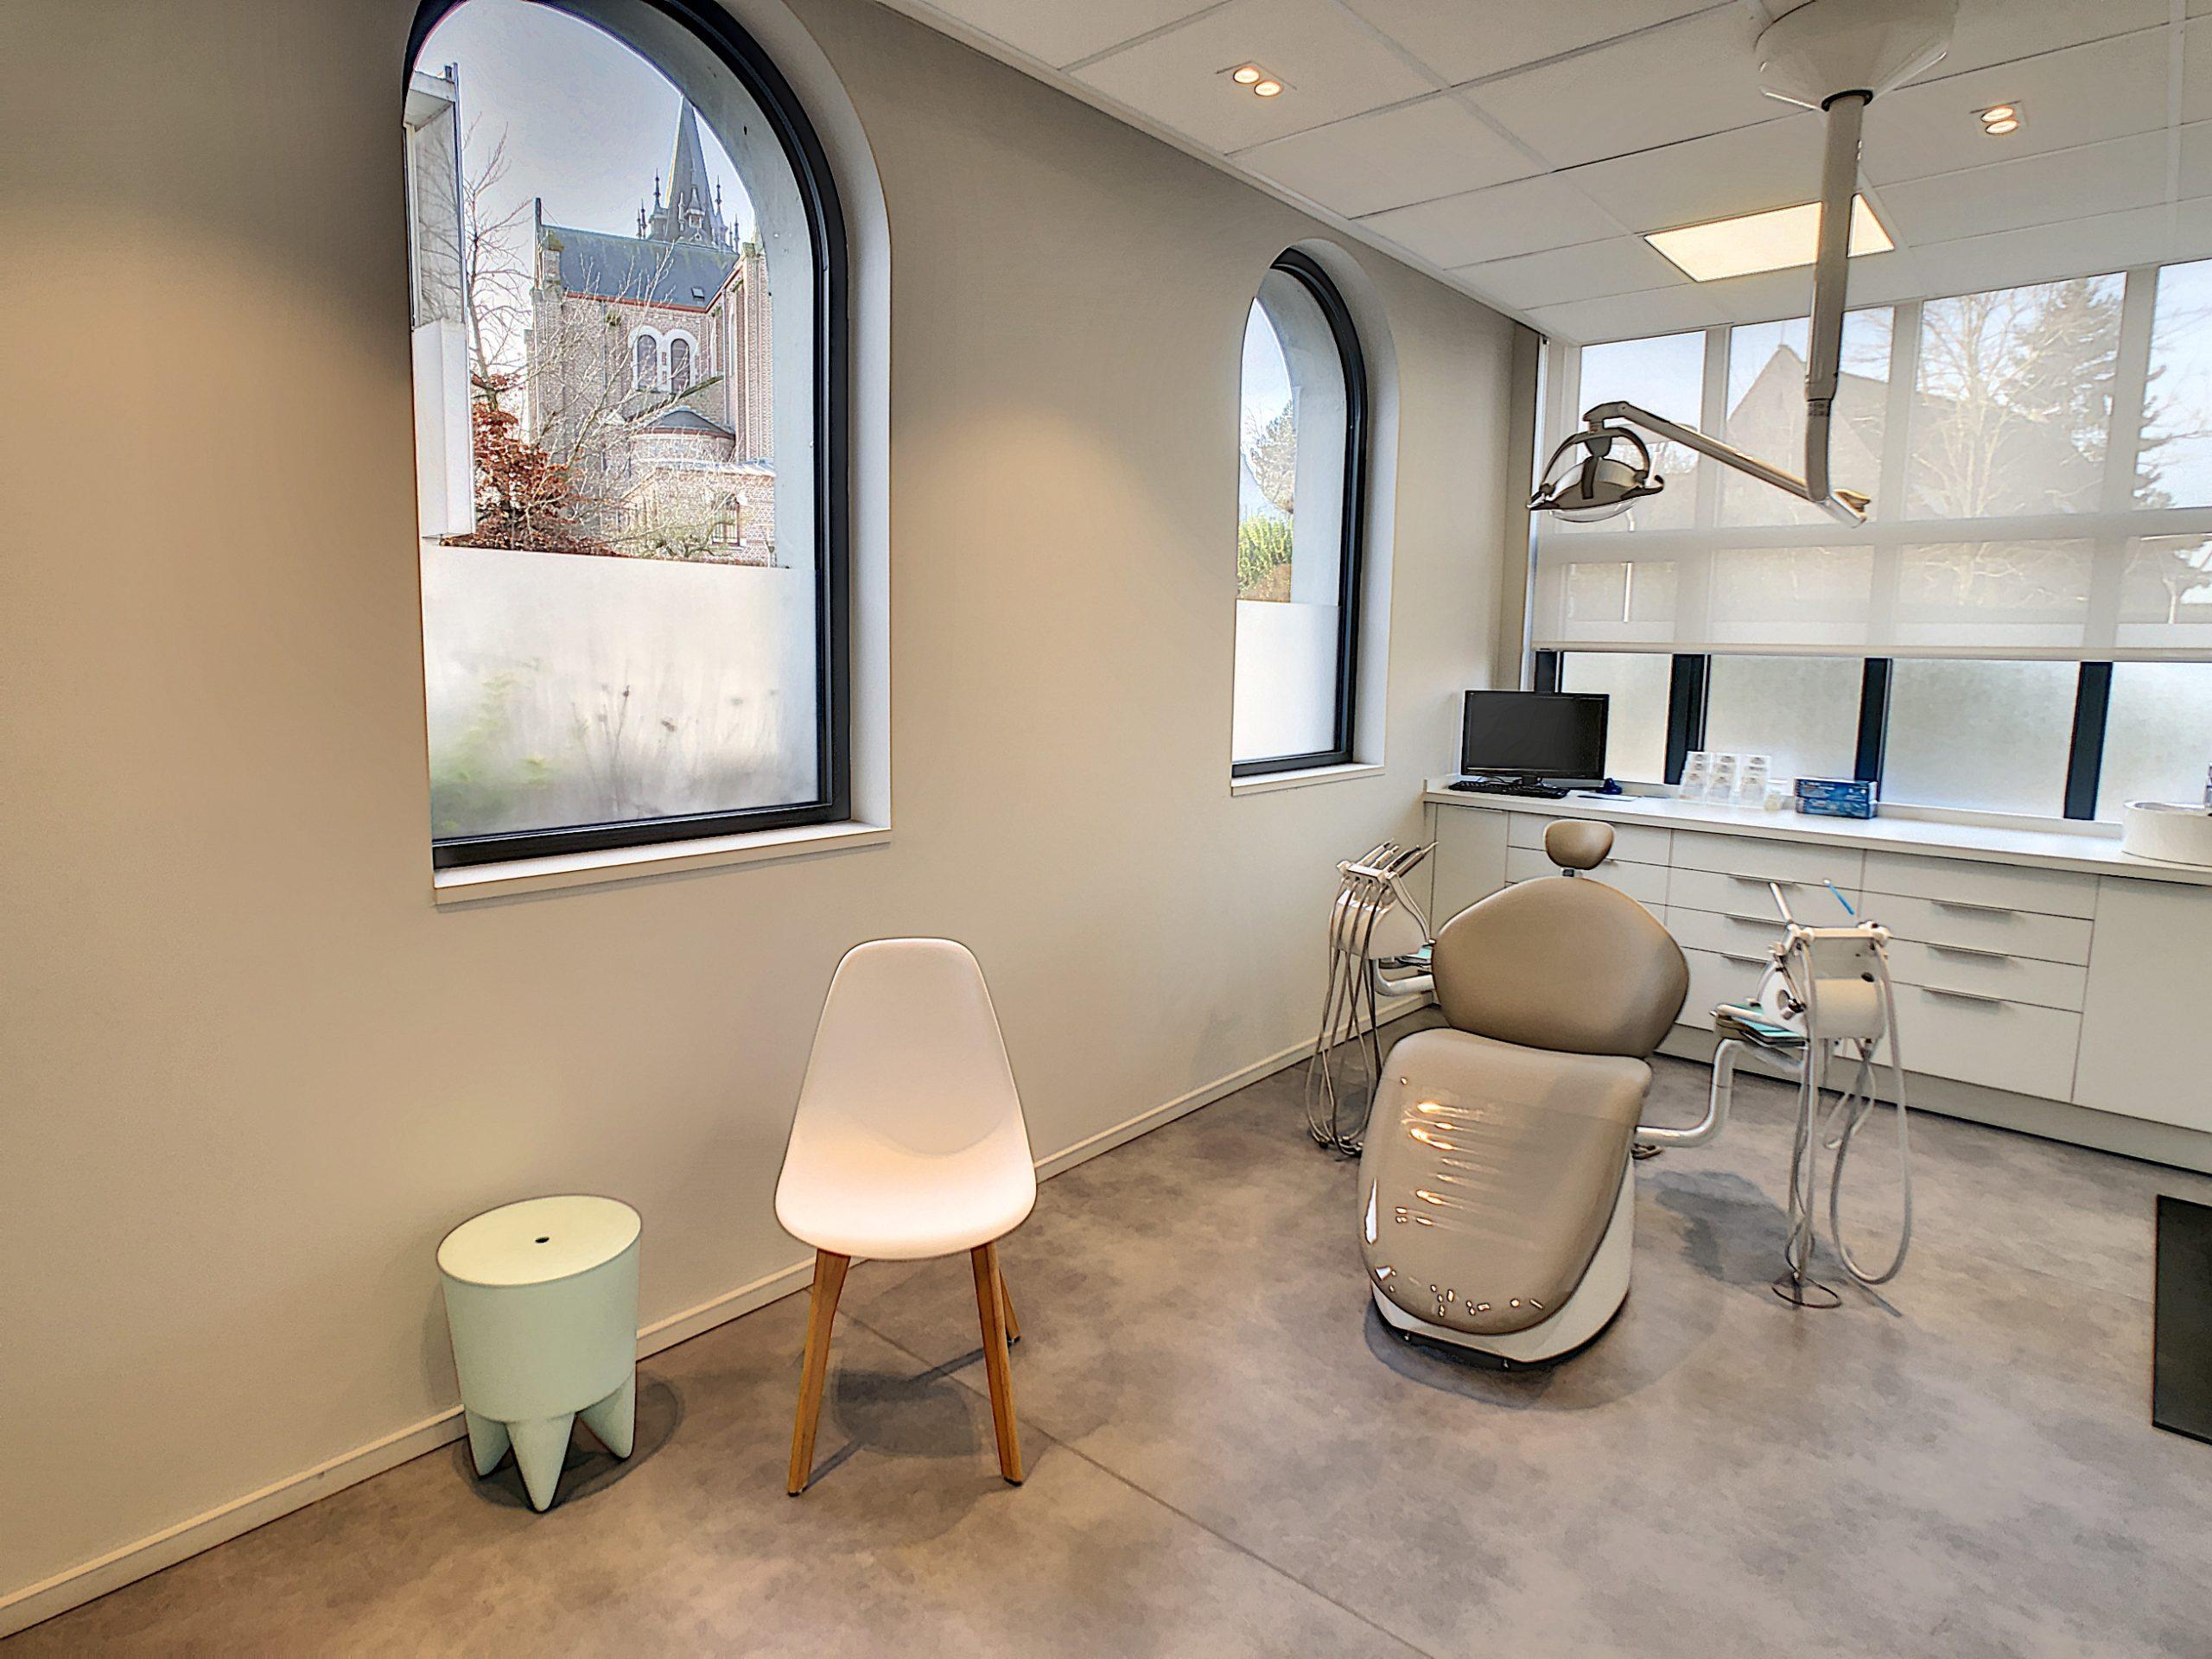 La salle de soin du cabinet d'orthodontie Cavrot Wambergue